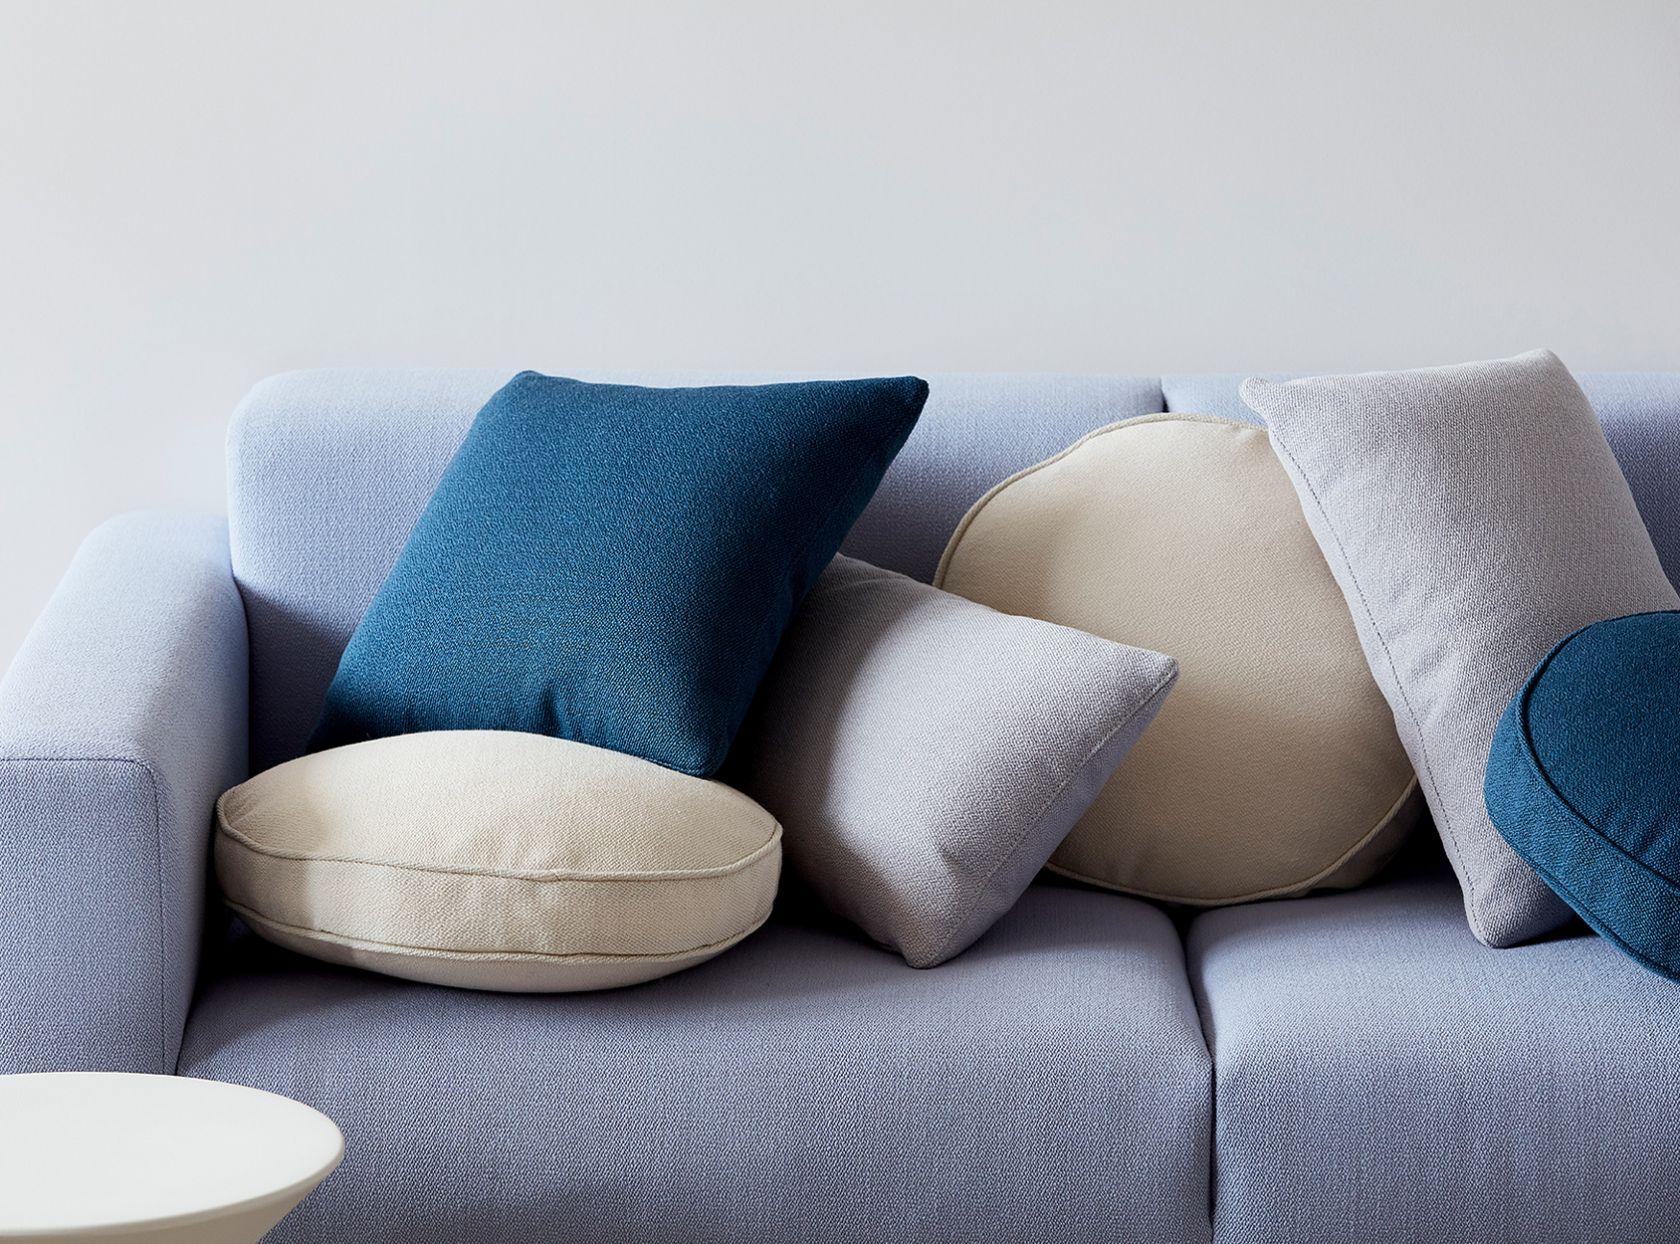 schiavello accessories scatter cushions on blue elfin sofa